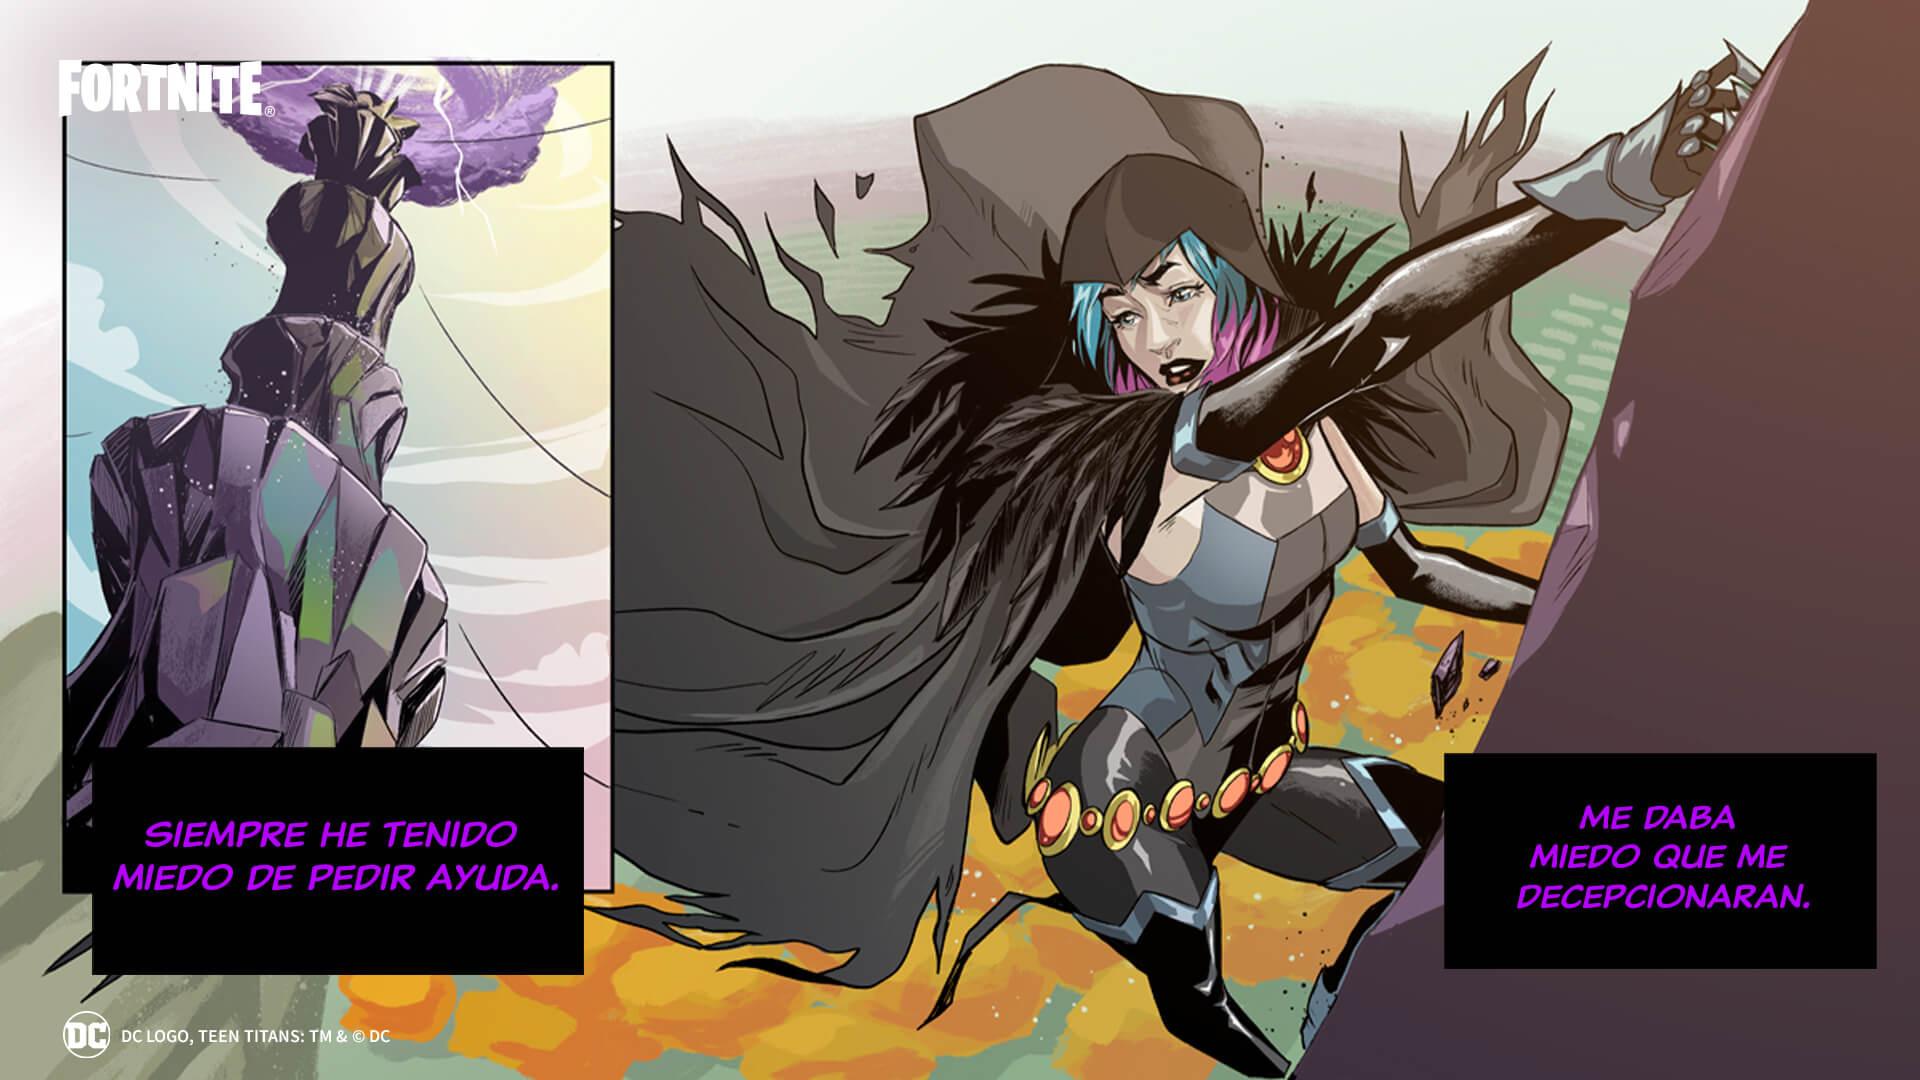 ES ES Raven BeastBoy S16 01 Social 1920x1080 1